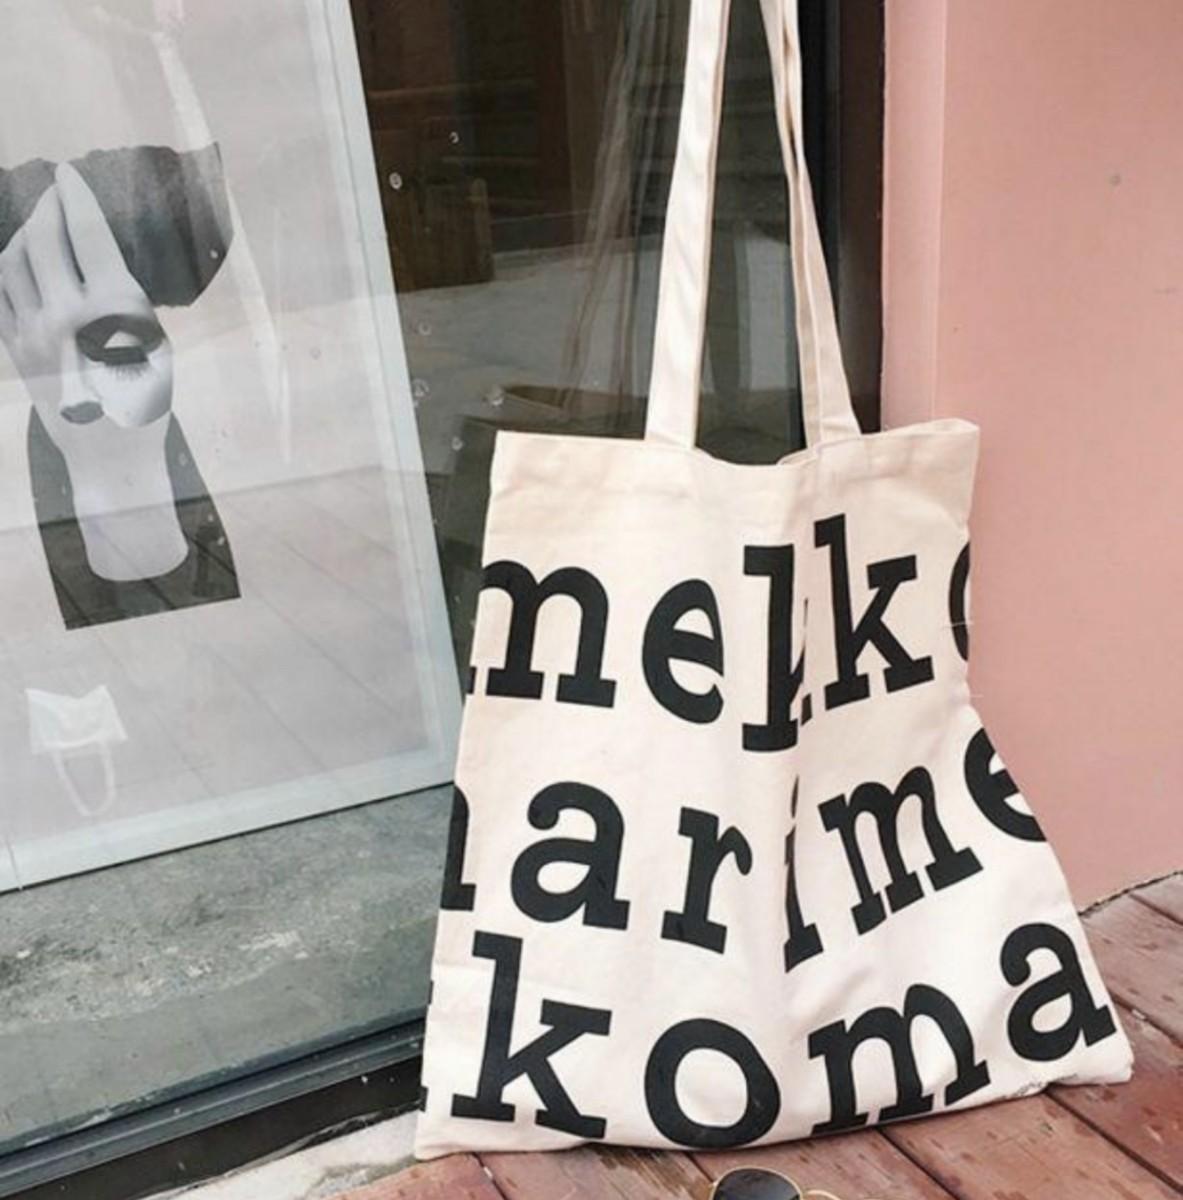 marimekko マリメッコ ロゴ トートバッグ  マザーズバッグ エコバッグ